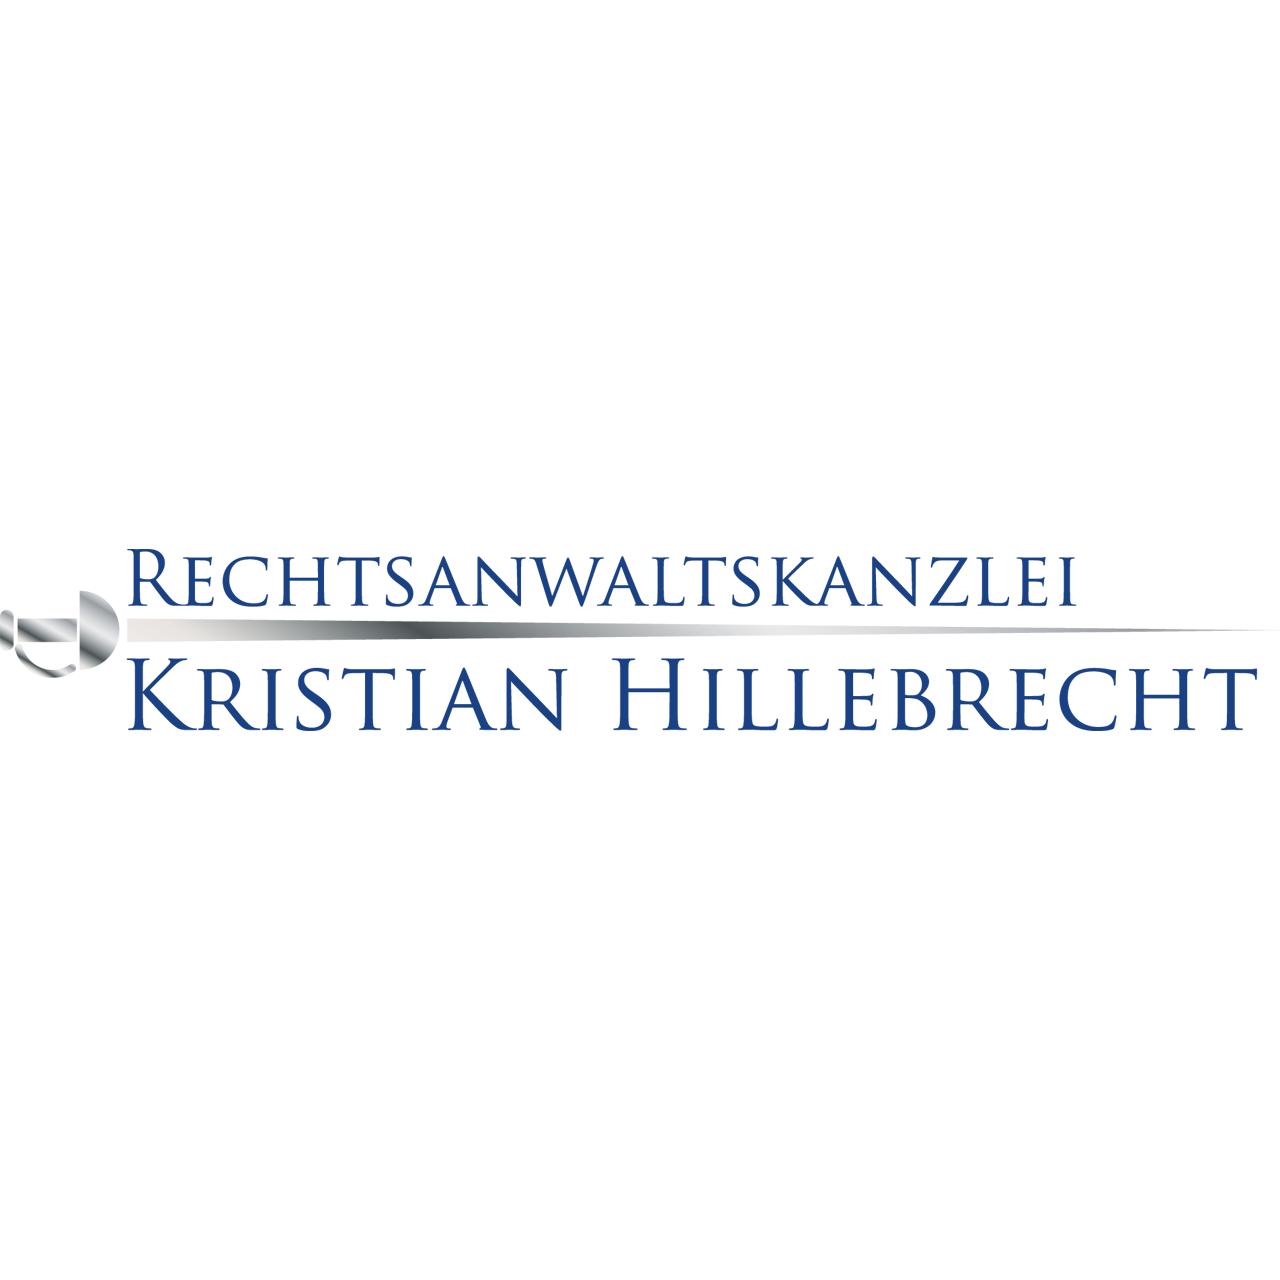 Bild zu Arbeitsrecht, Insolvenzrecht und Zivilrecht - Rechtsanwalt Kristian Hillebrecht - Frankfurt in Frankfurt am Main